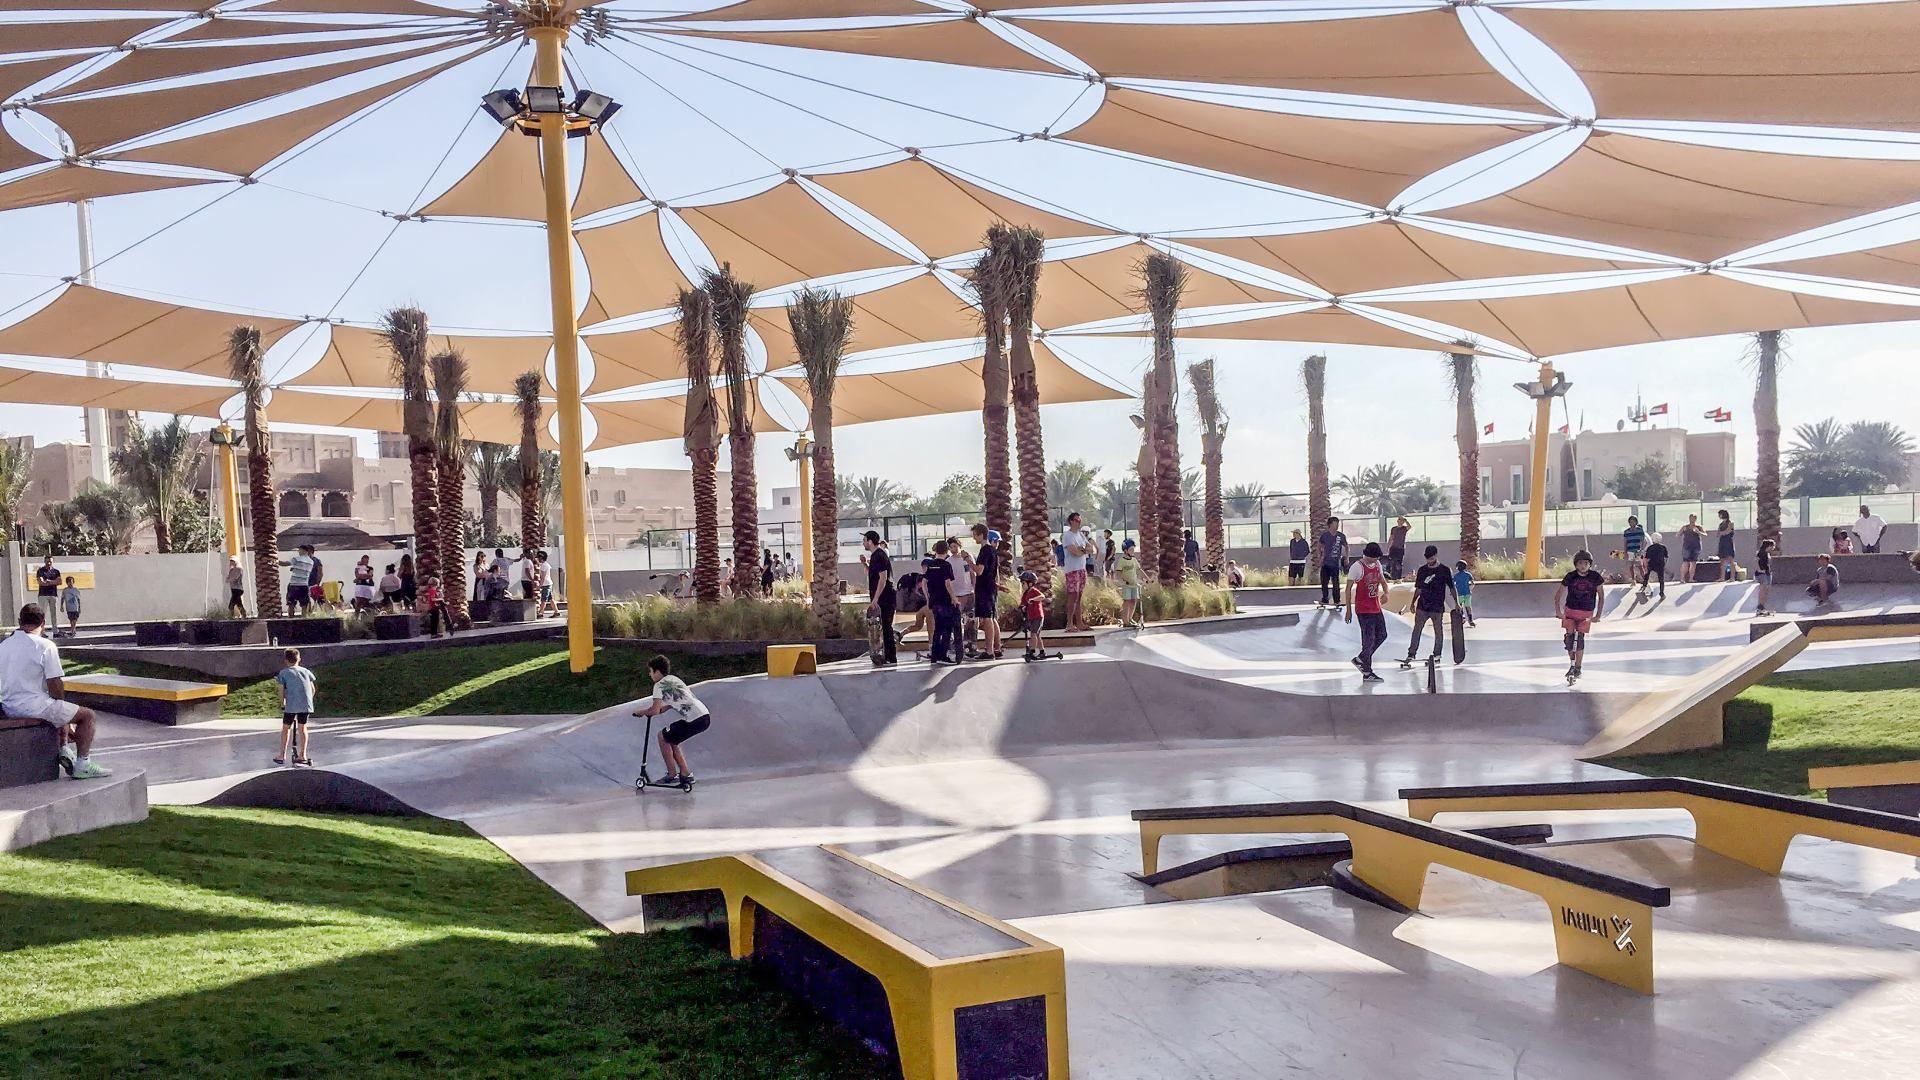 XDUBAI Skatepark Dubai 2020